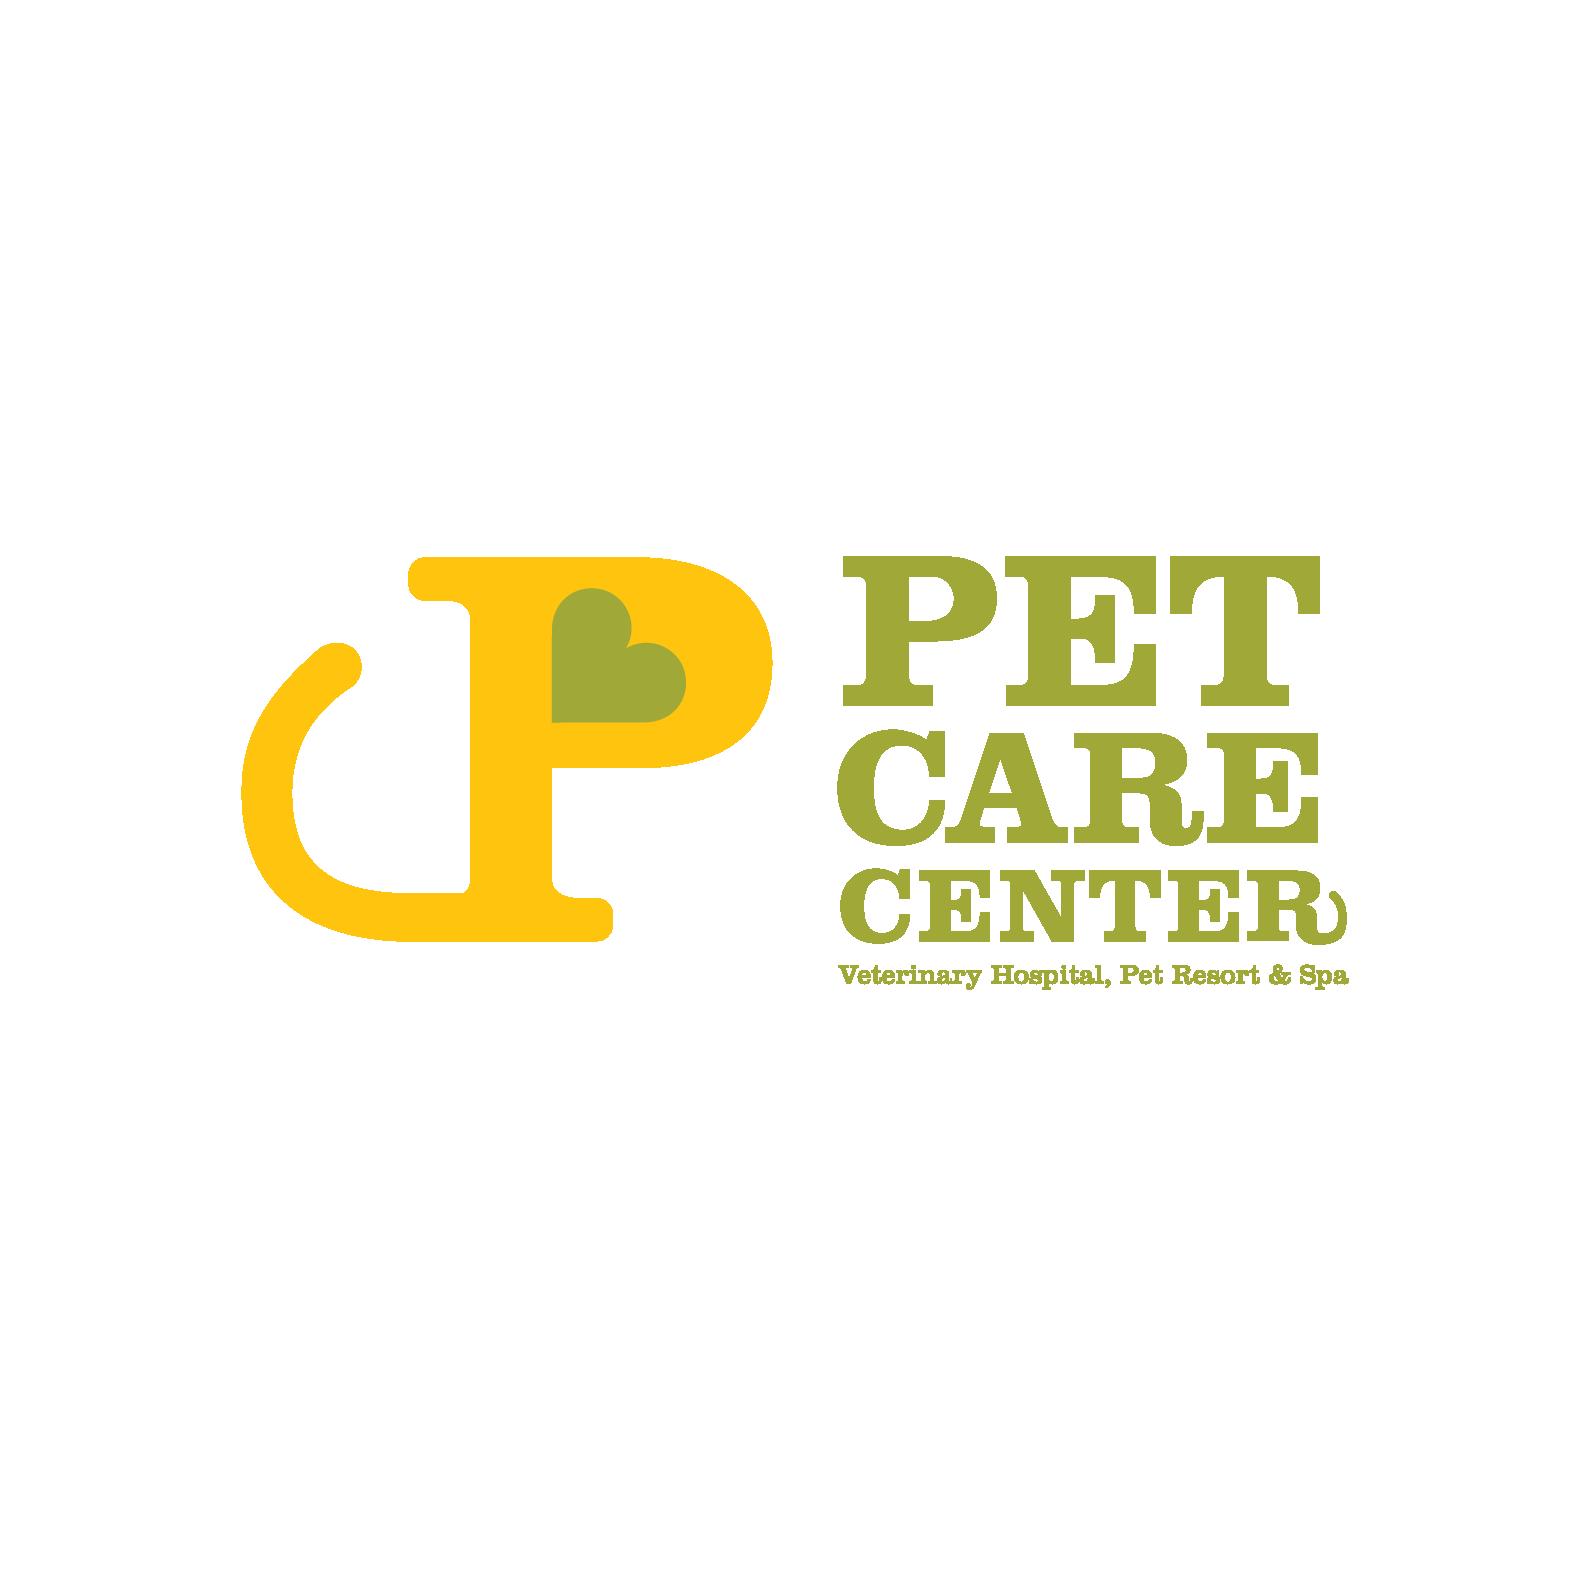 PCC-Individual Logos-03.png